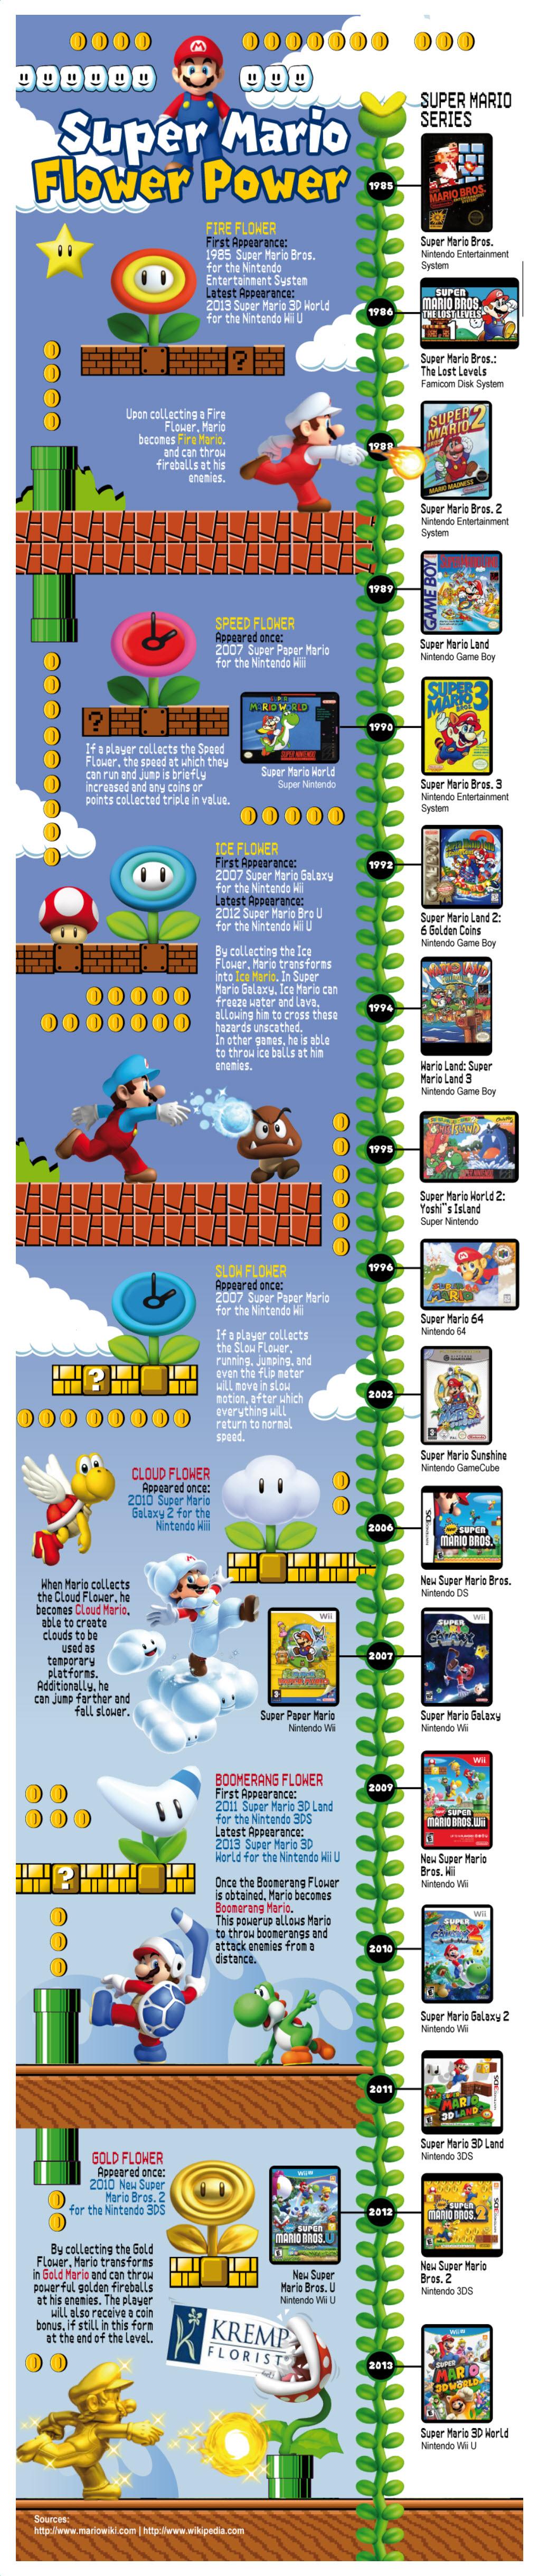 Super Mario Flower Power Infographic